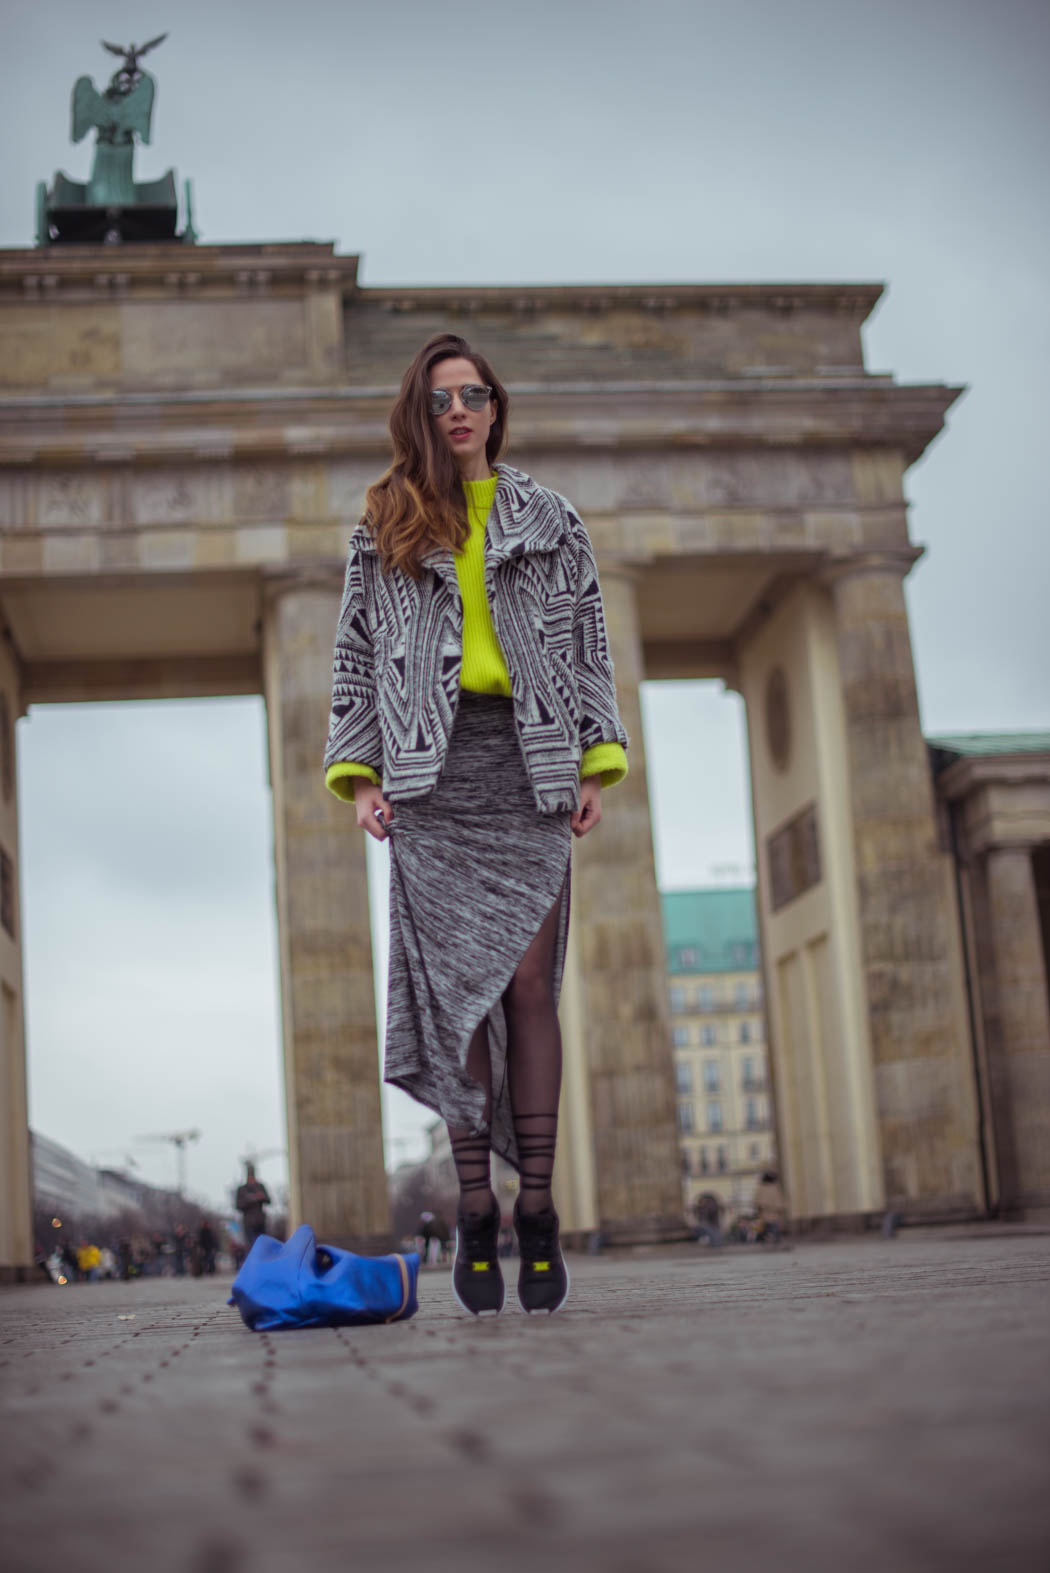 Dior-so-real-neongrüner-Pullover-Cos-Fashionblogger-München-Berlin-Deutschland-Lindarella-Streetstyle-8